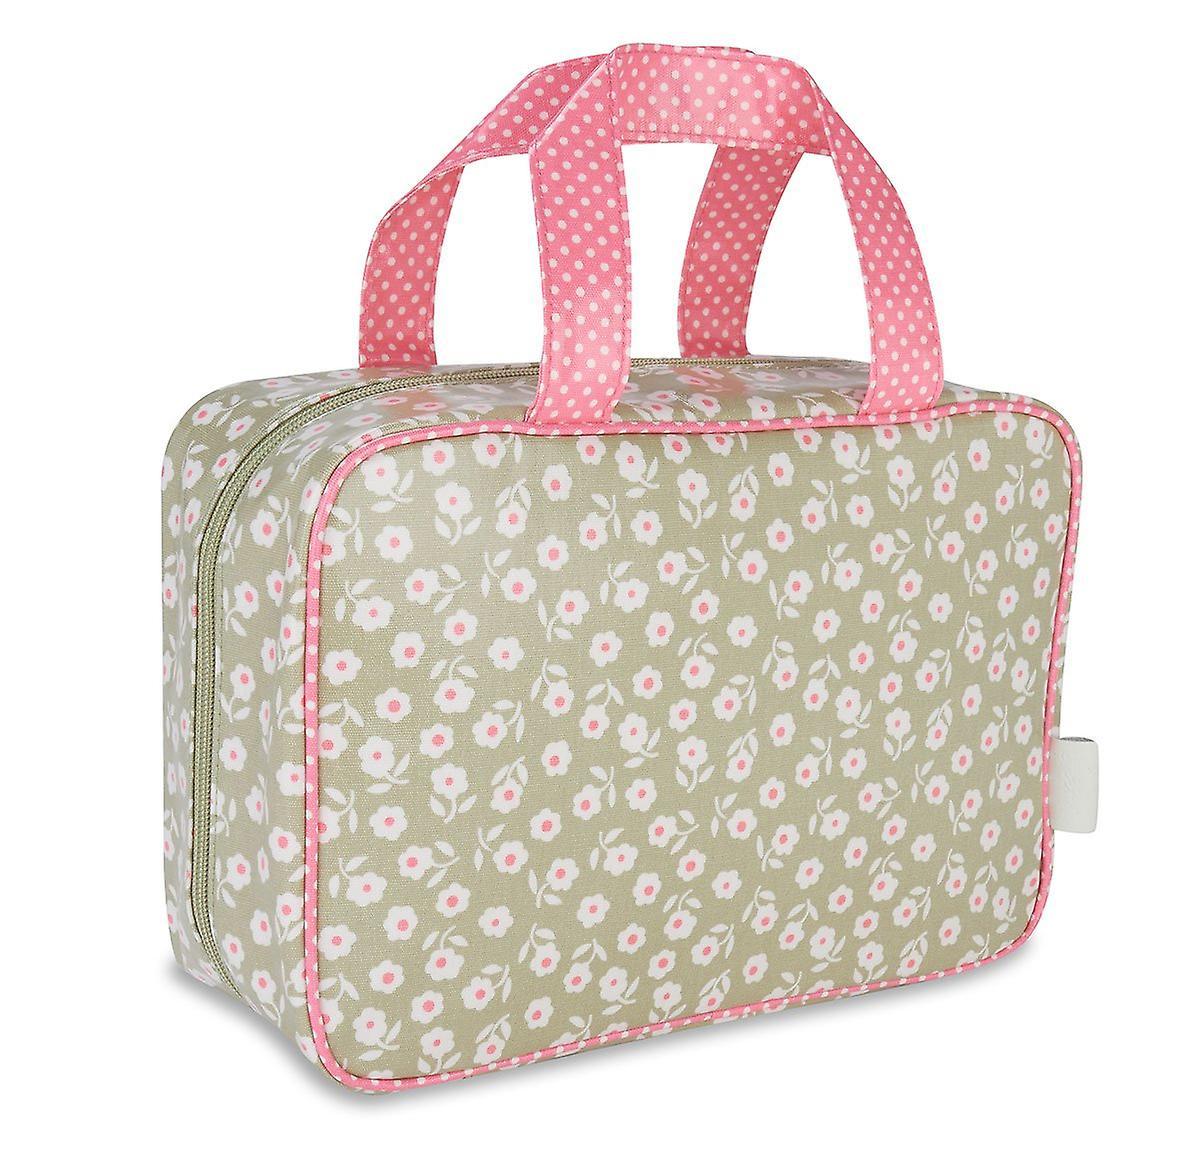 'victoria green' hanging traveller wash bag - daisy sage